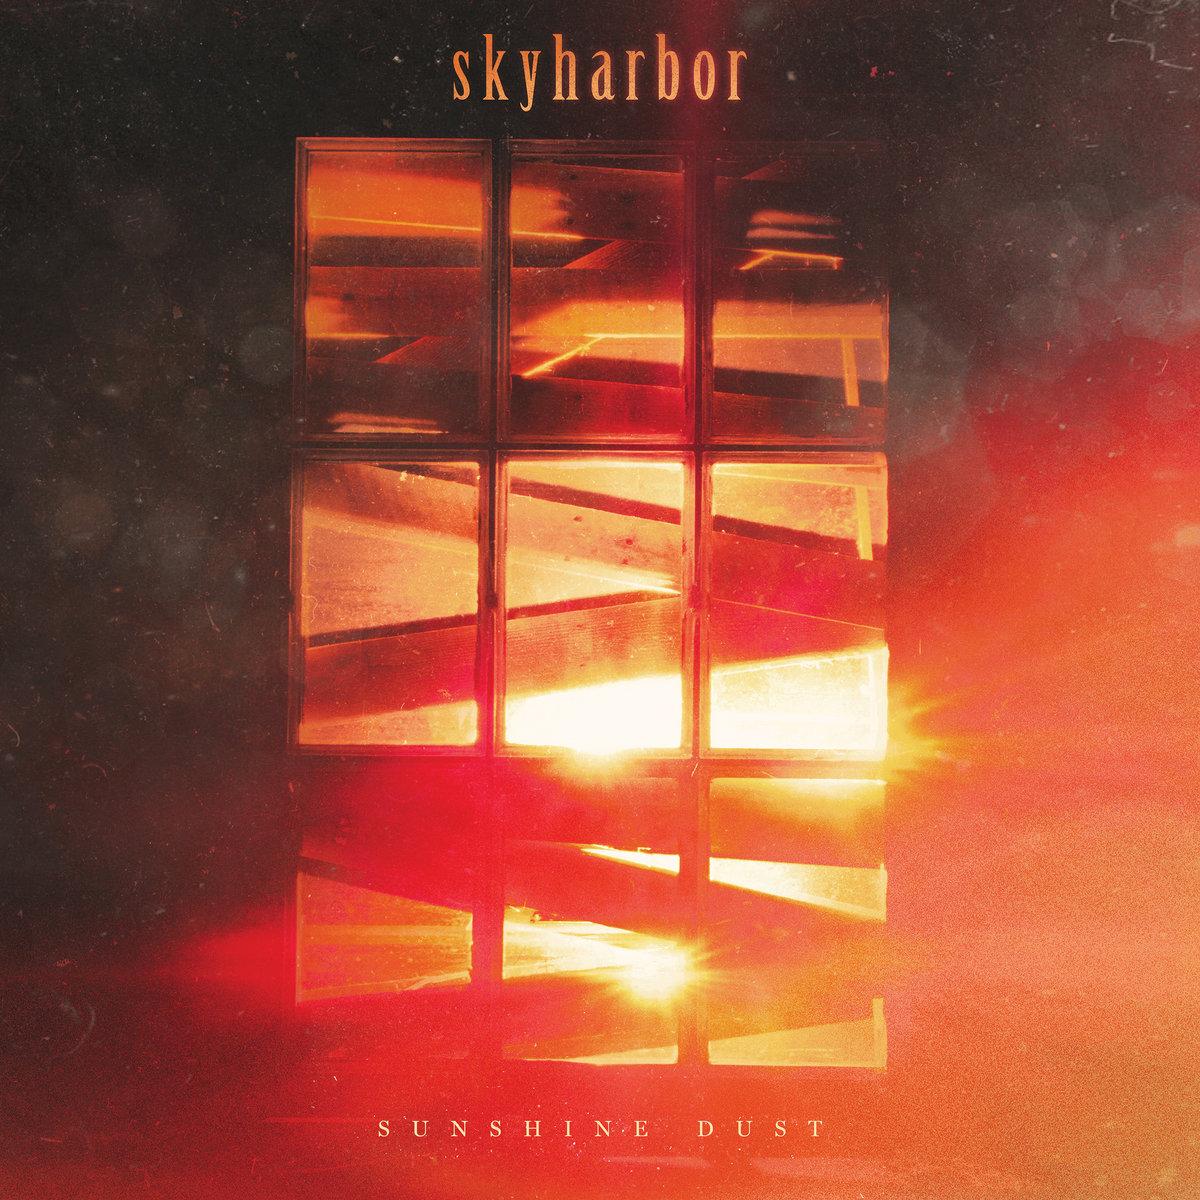 Sunshine Dust | Skyharbor